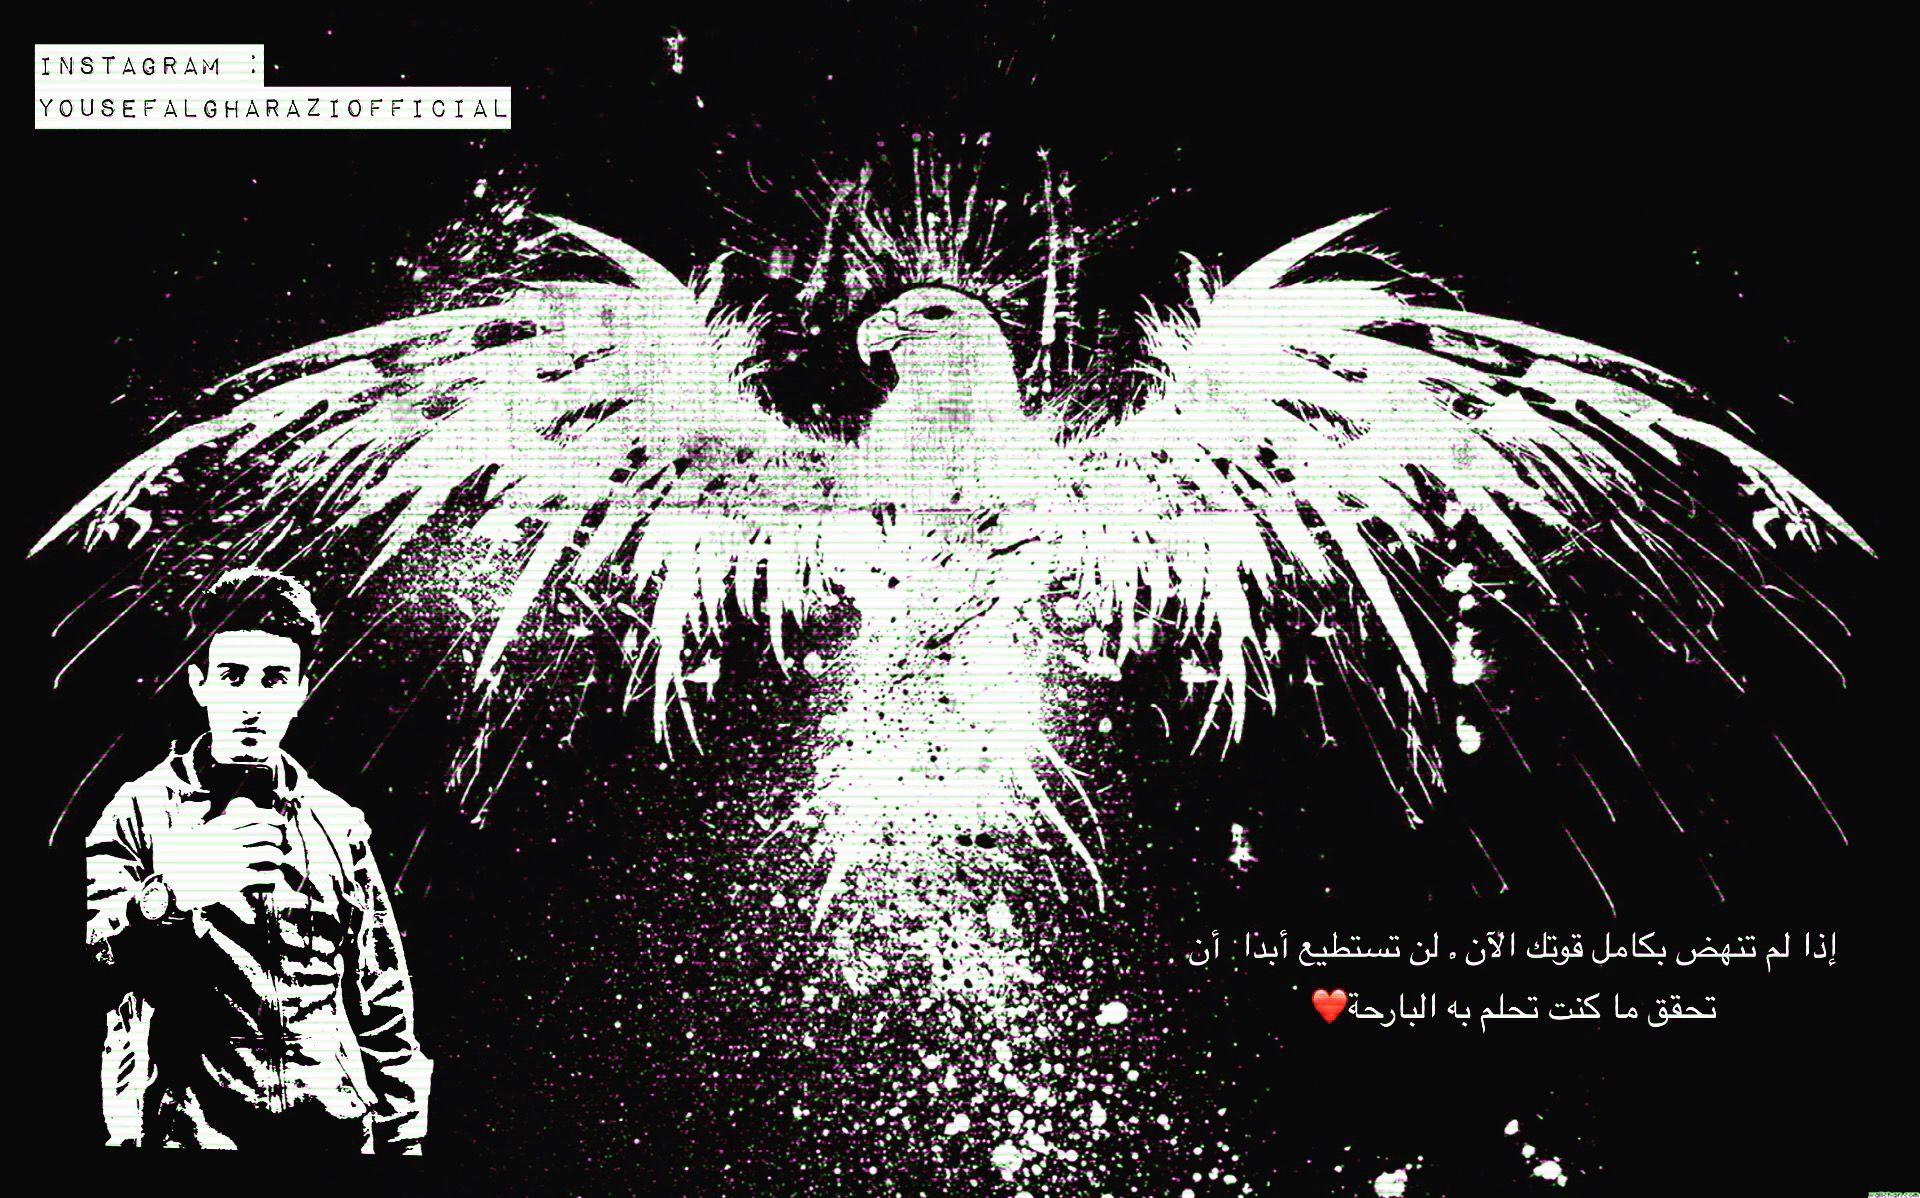 Yousef_algharazi Grunge artwork